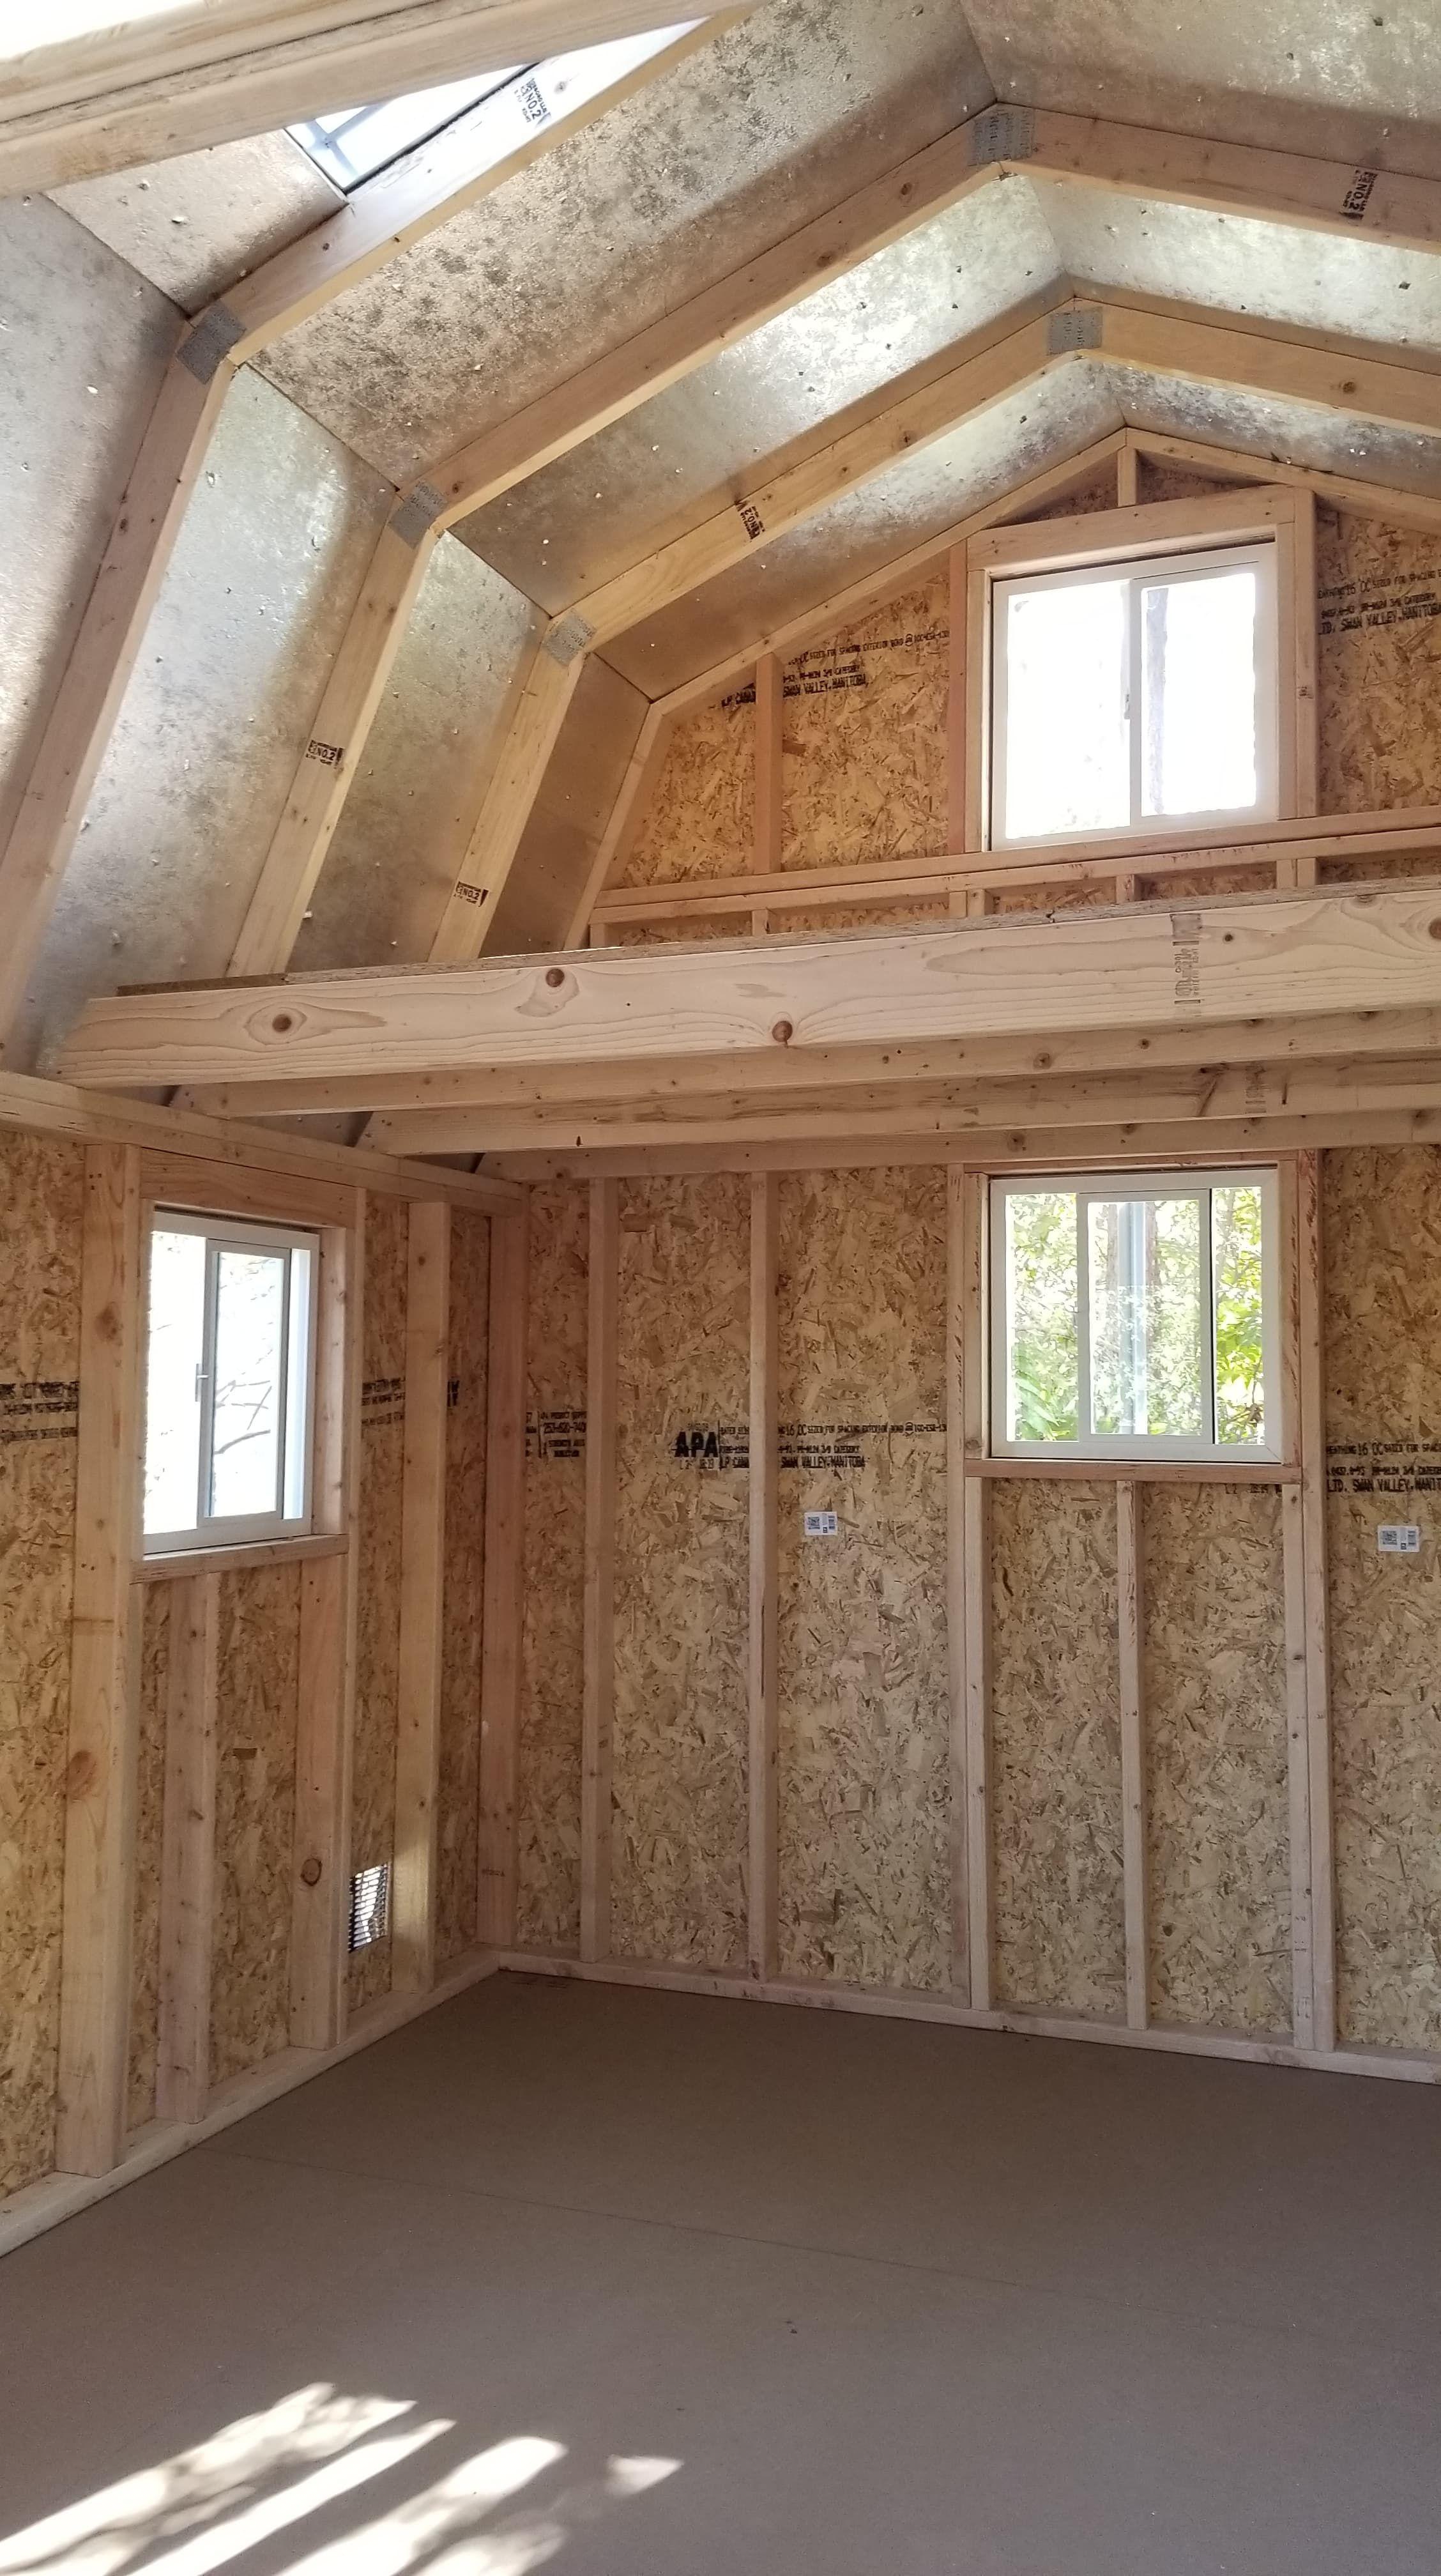 10x16 Barn Shed Plans Shed With Loft Barns Sheds Diy Shed Plans